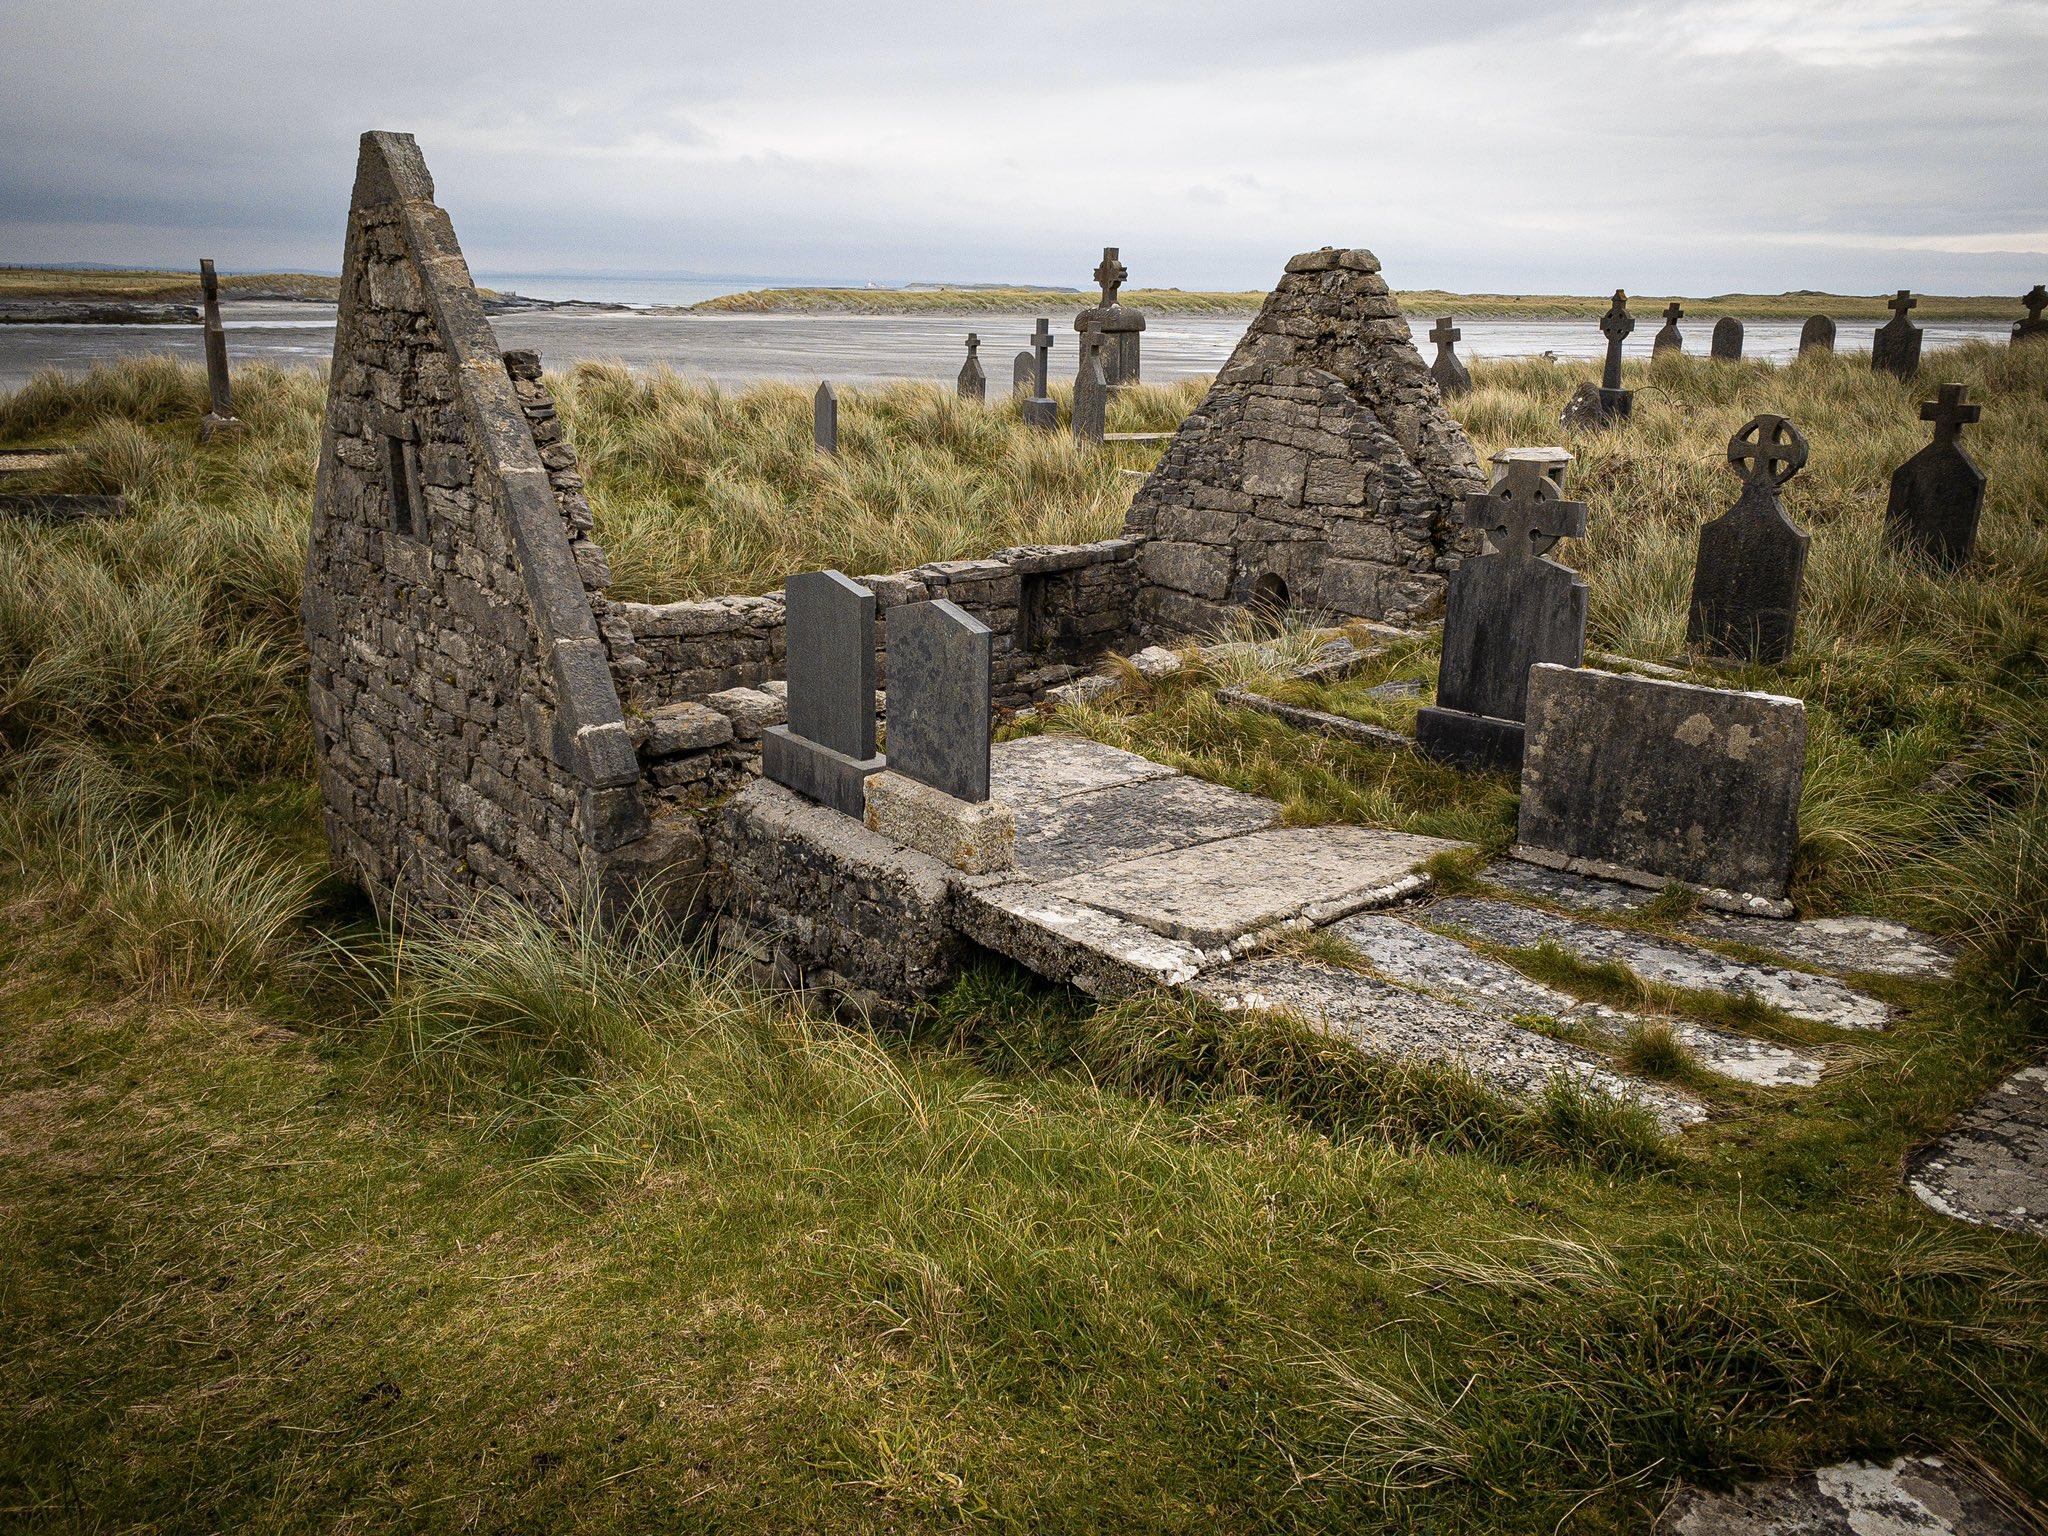 Church of St. Enda Teaghlach Éinne on the Aran Islands - Visit Galway